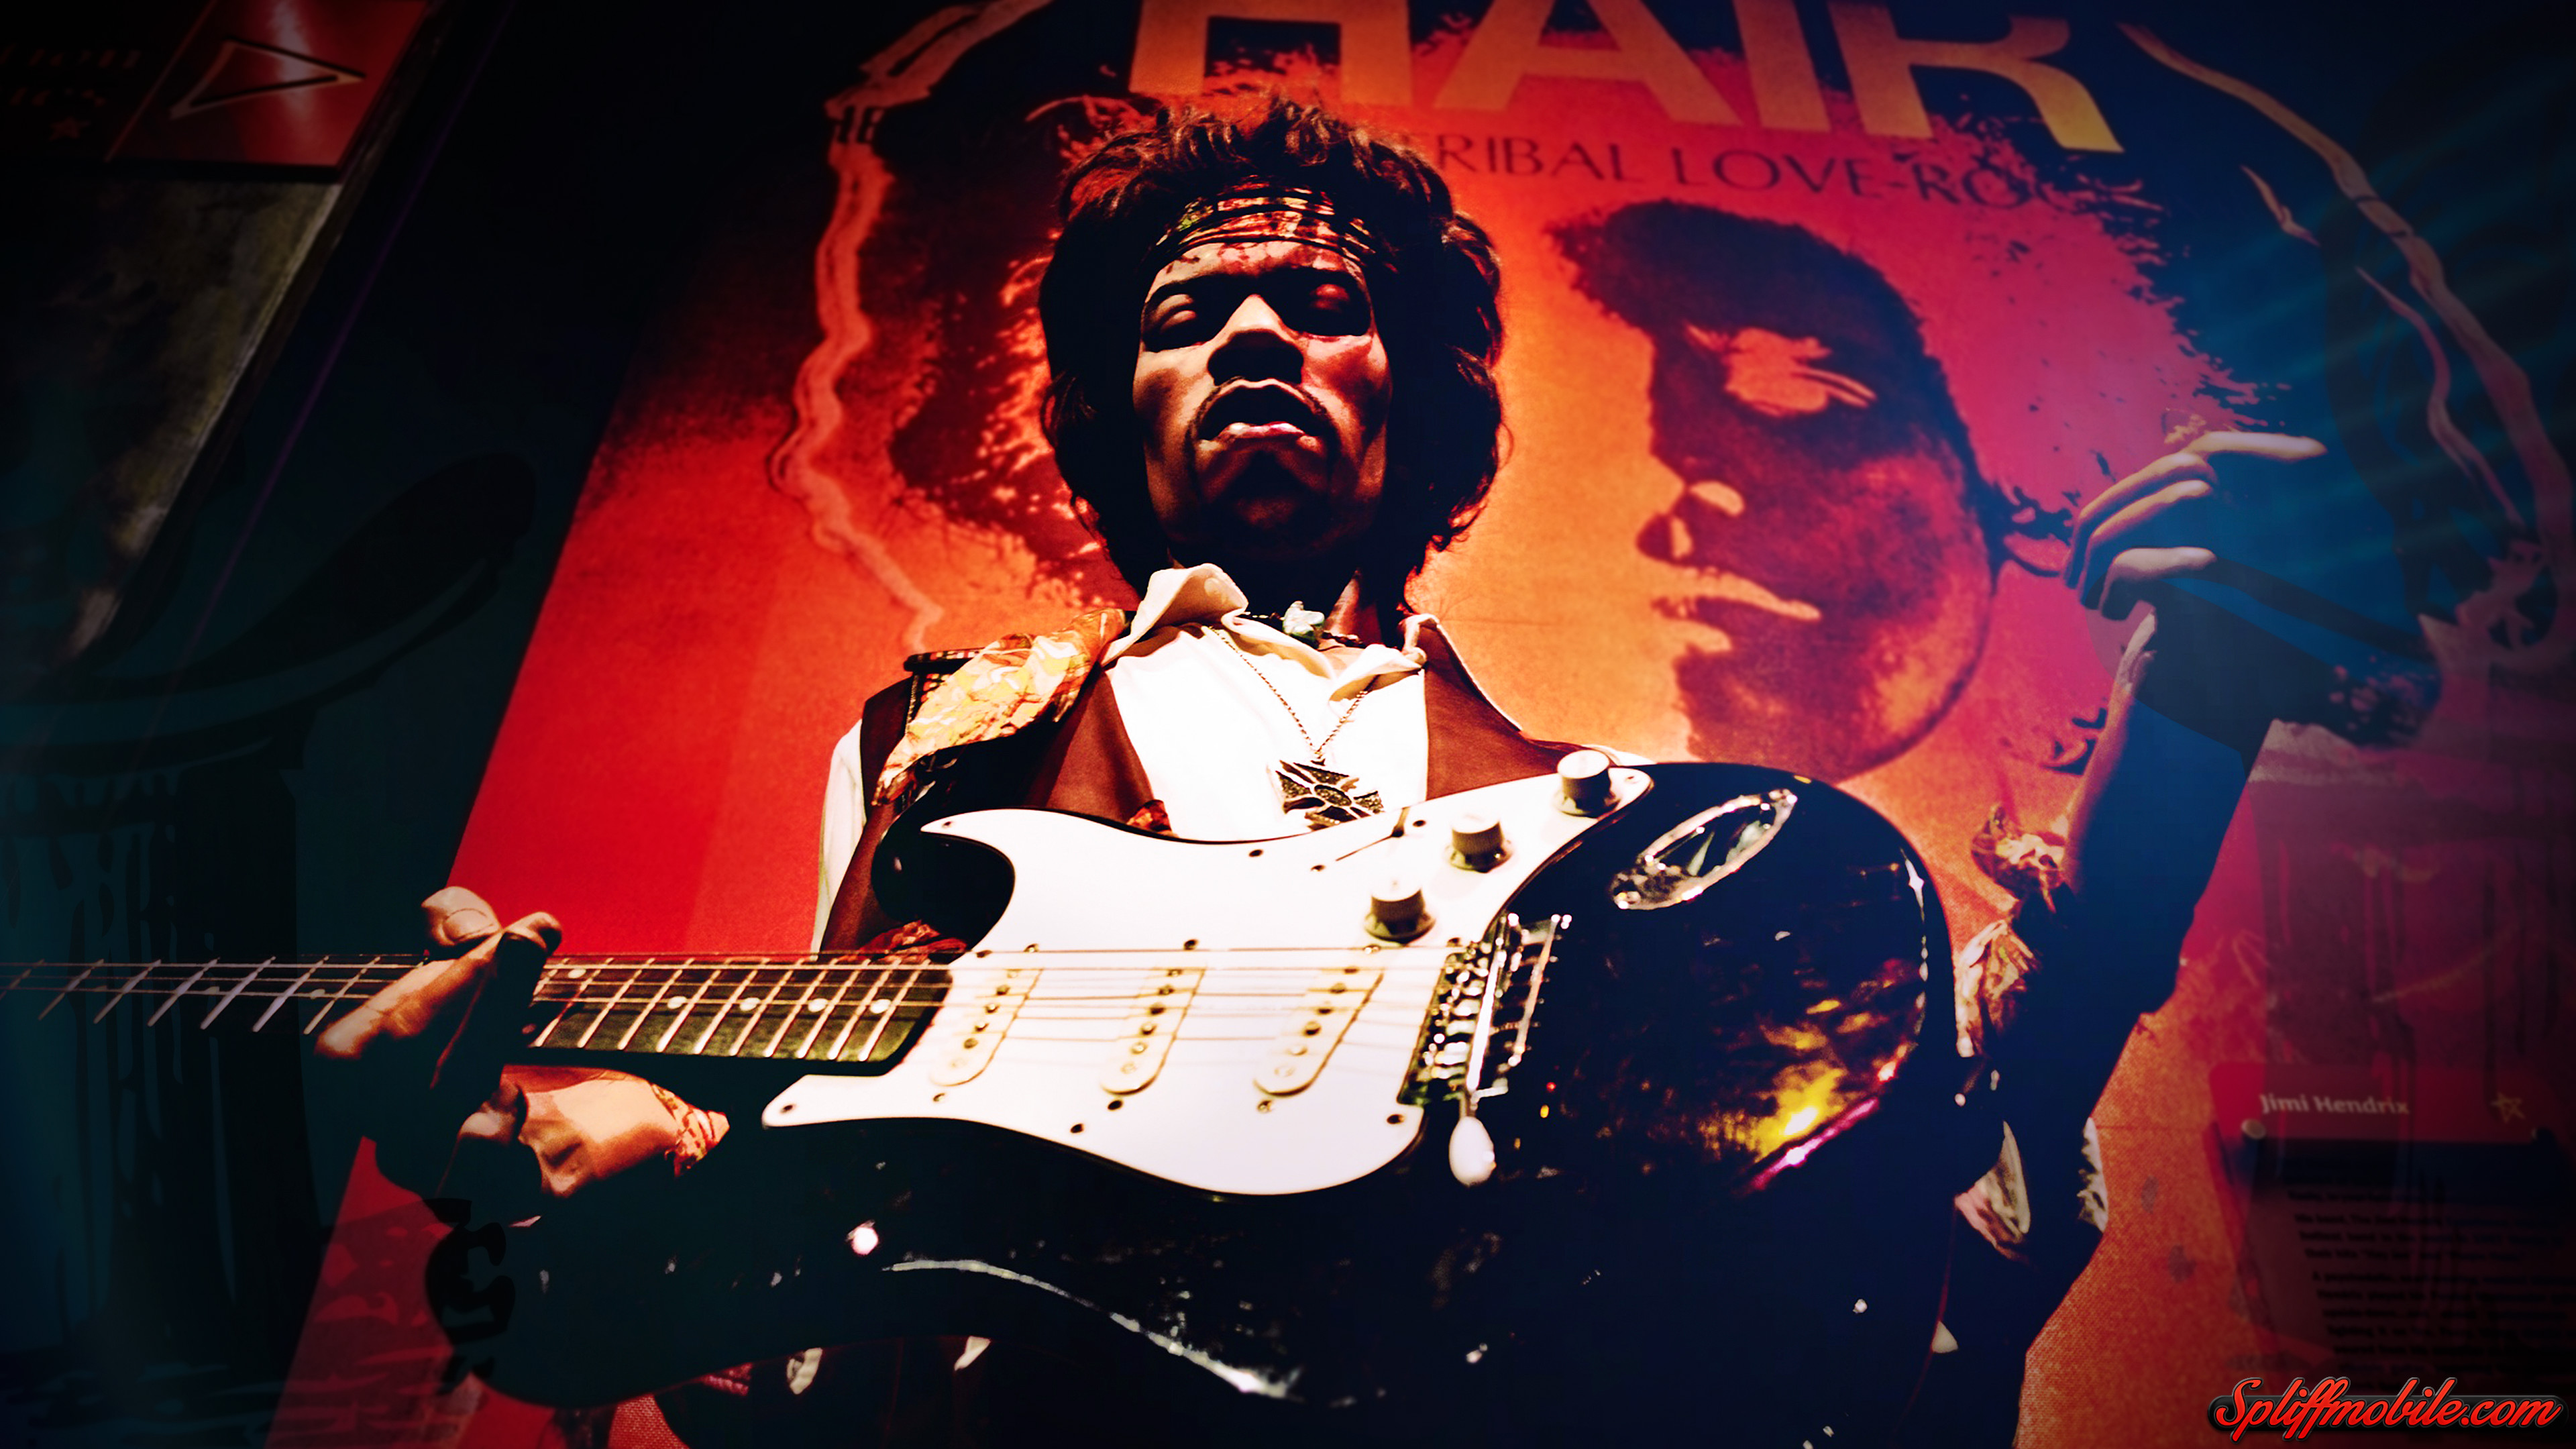 Jimi Hendrix Wallpaper (67+ images)